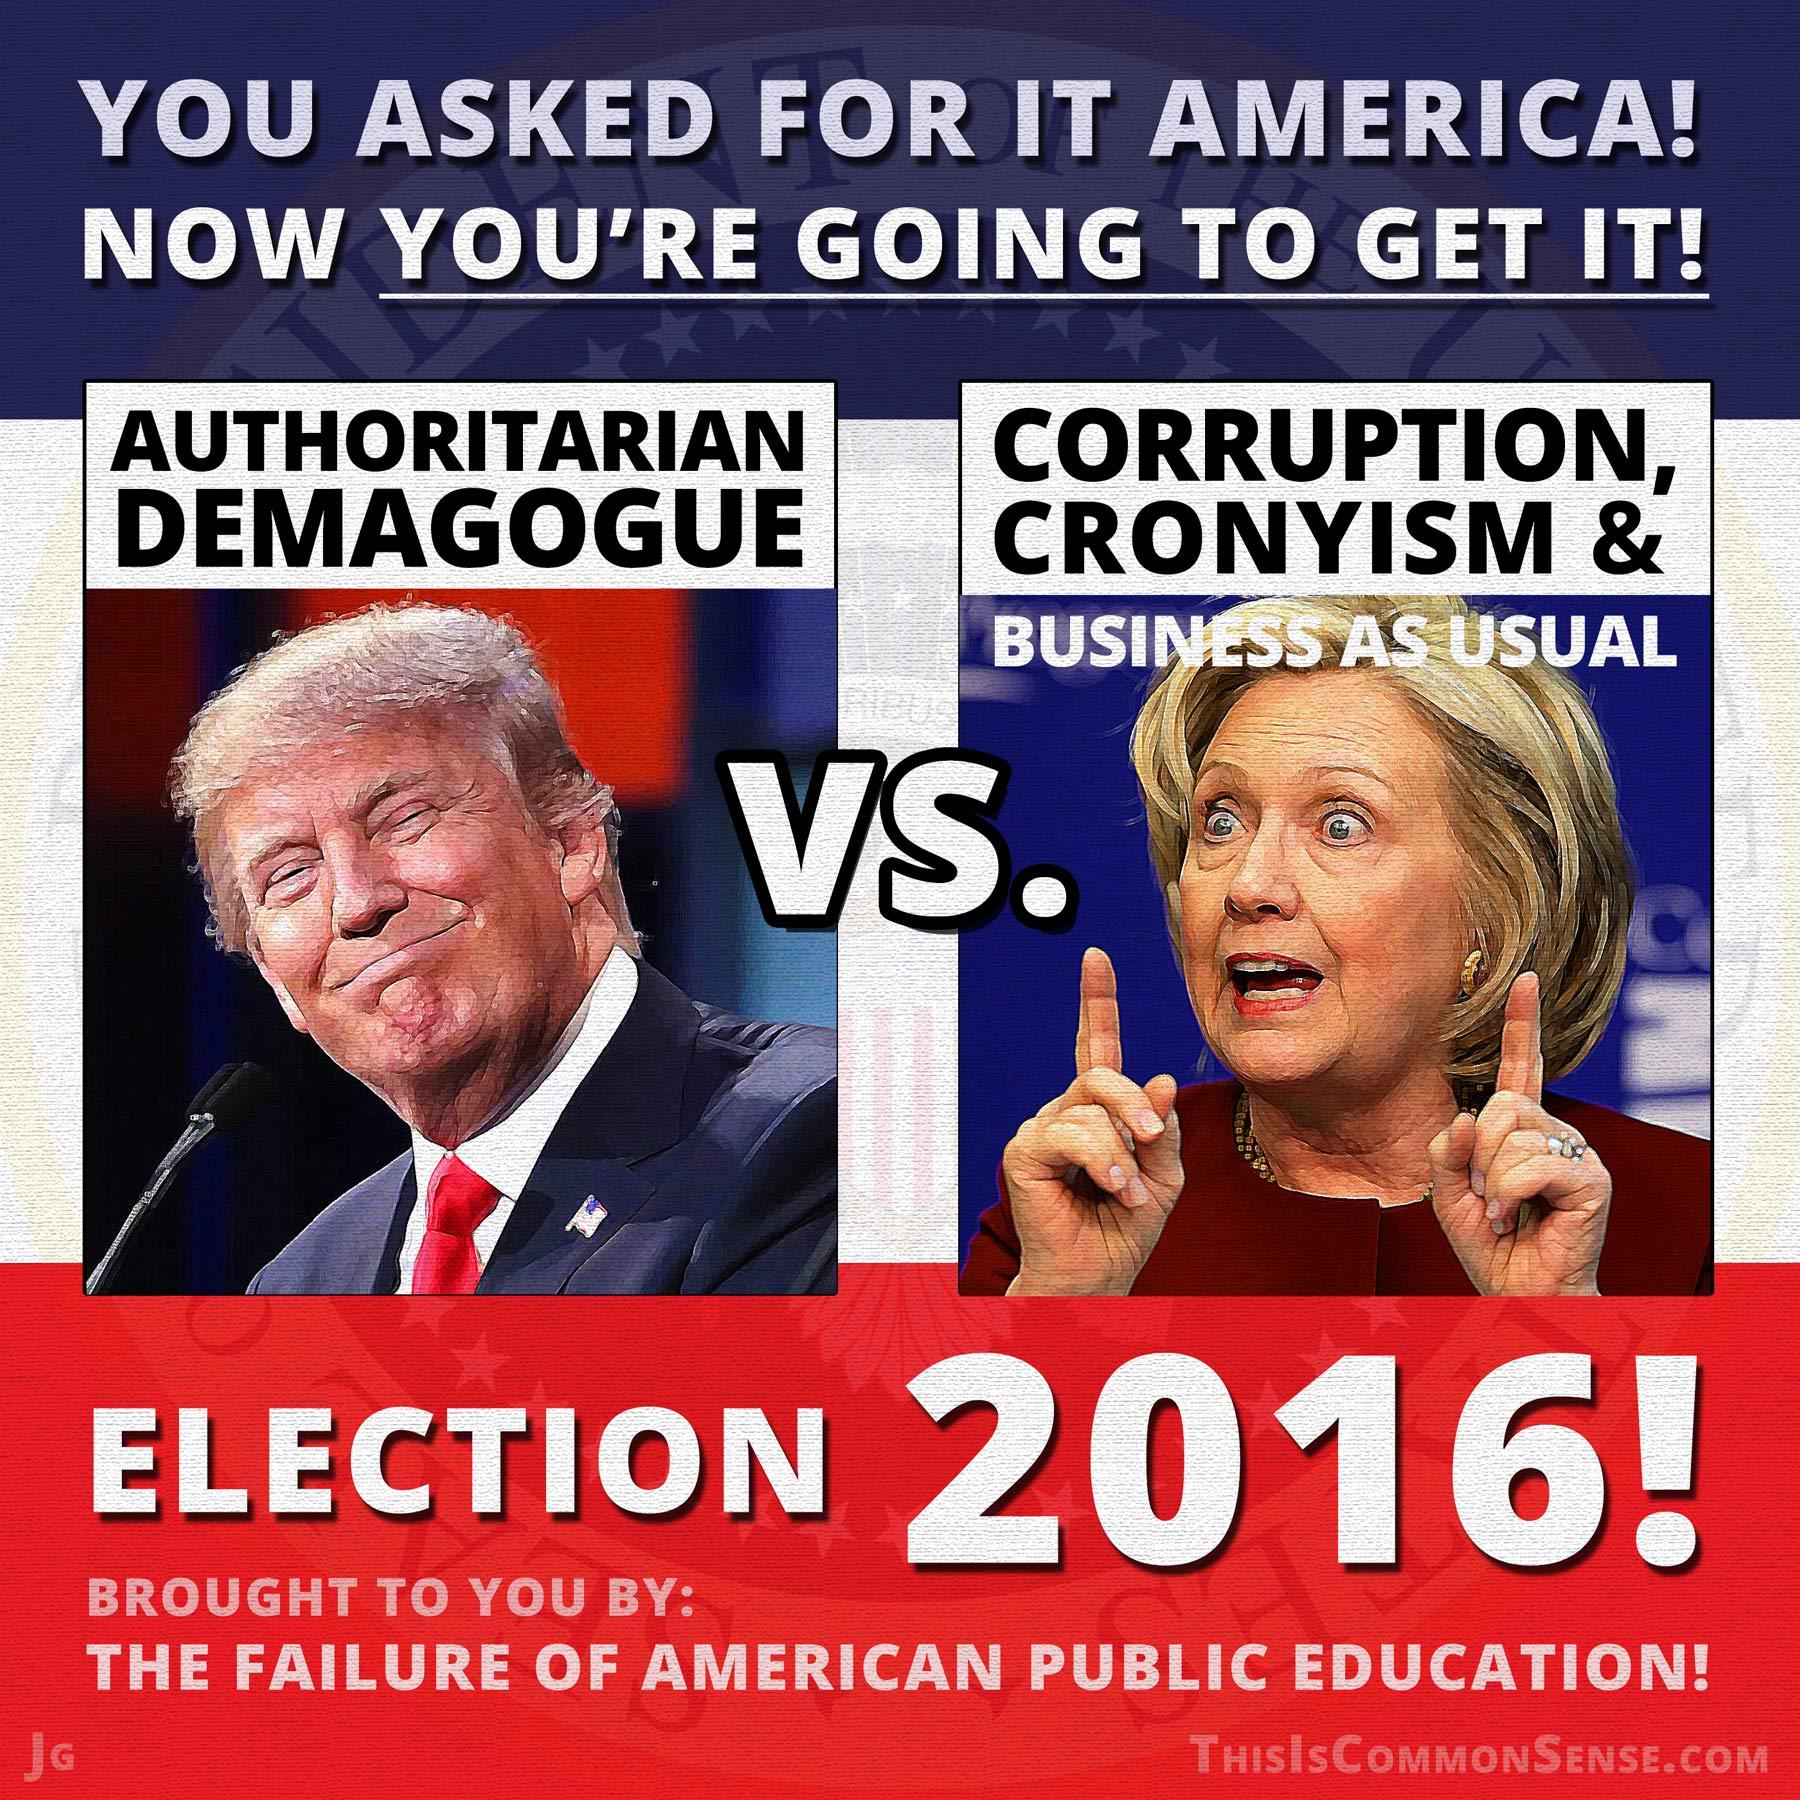 youaskedforit boiling it down hillary clinton vs donald trump john hively's